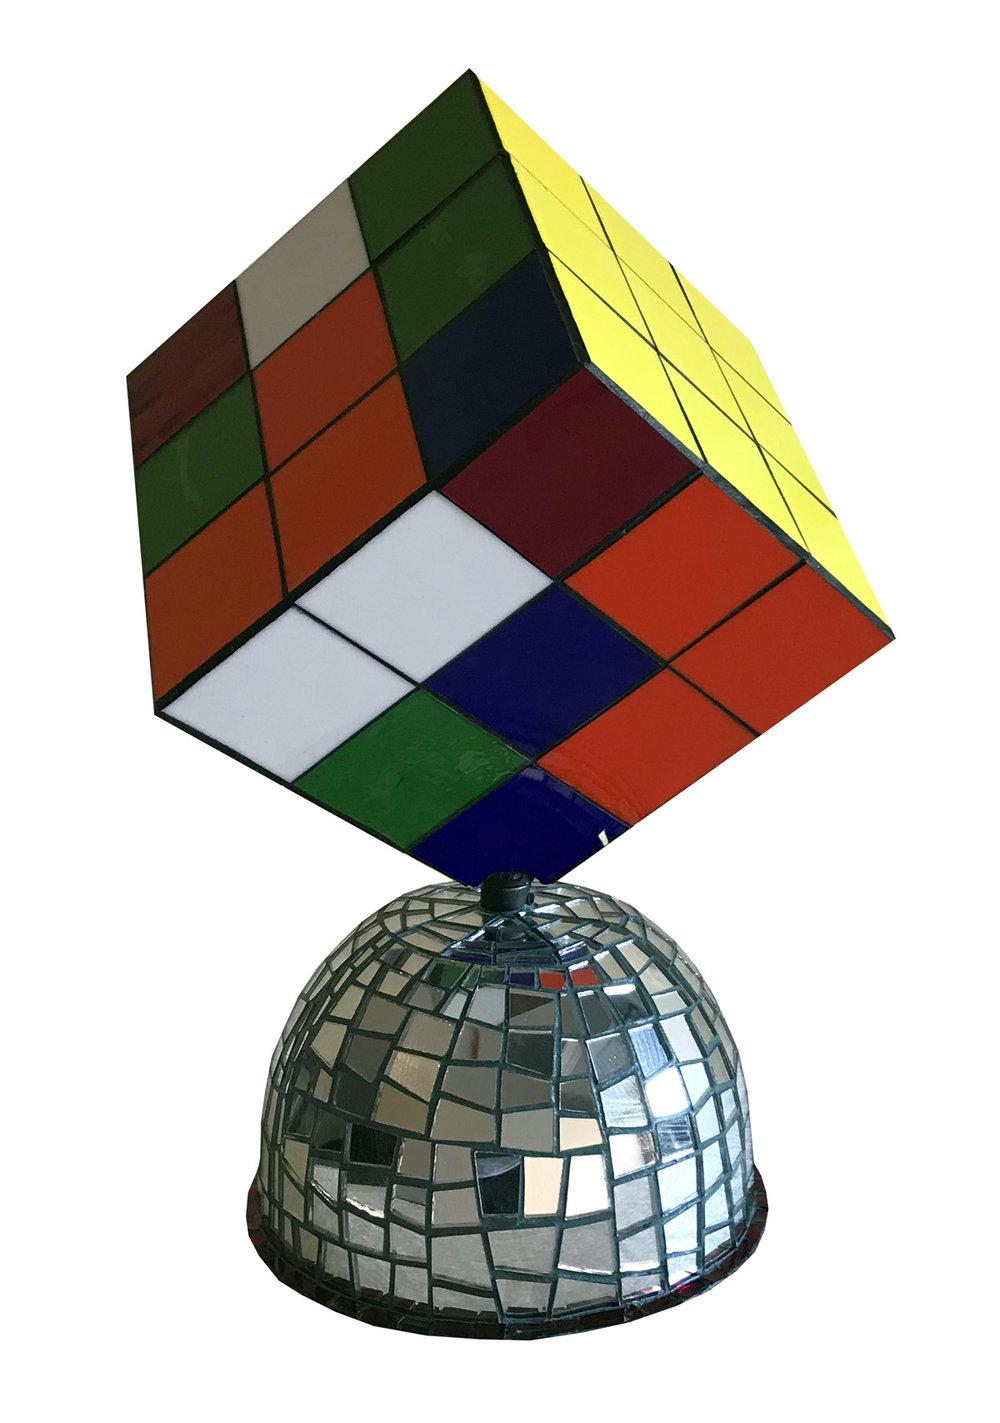 rubik's-cube-1.jpg